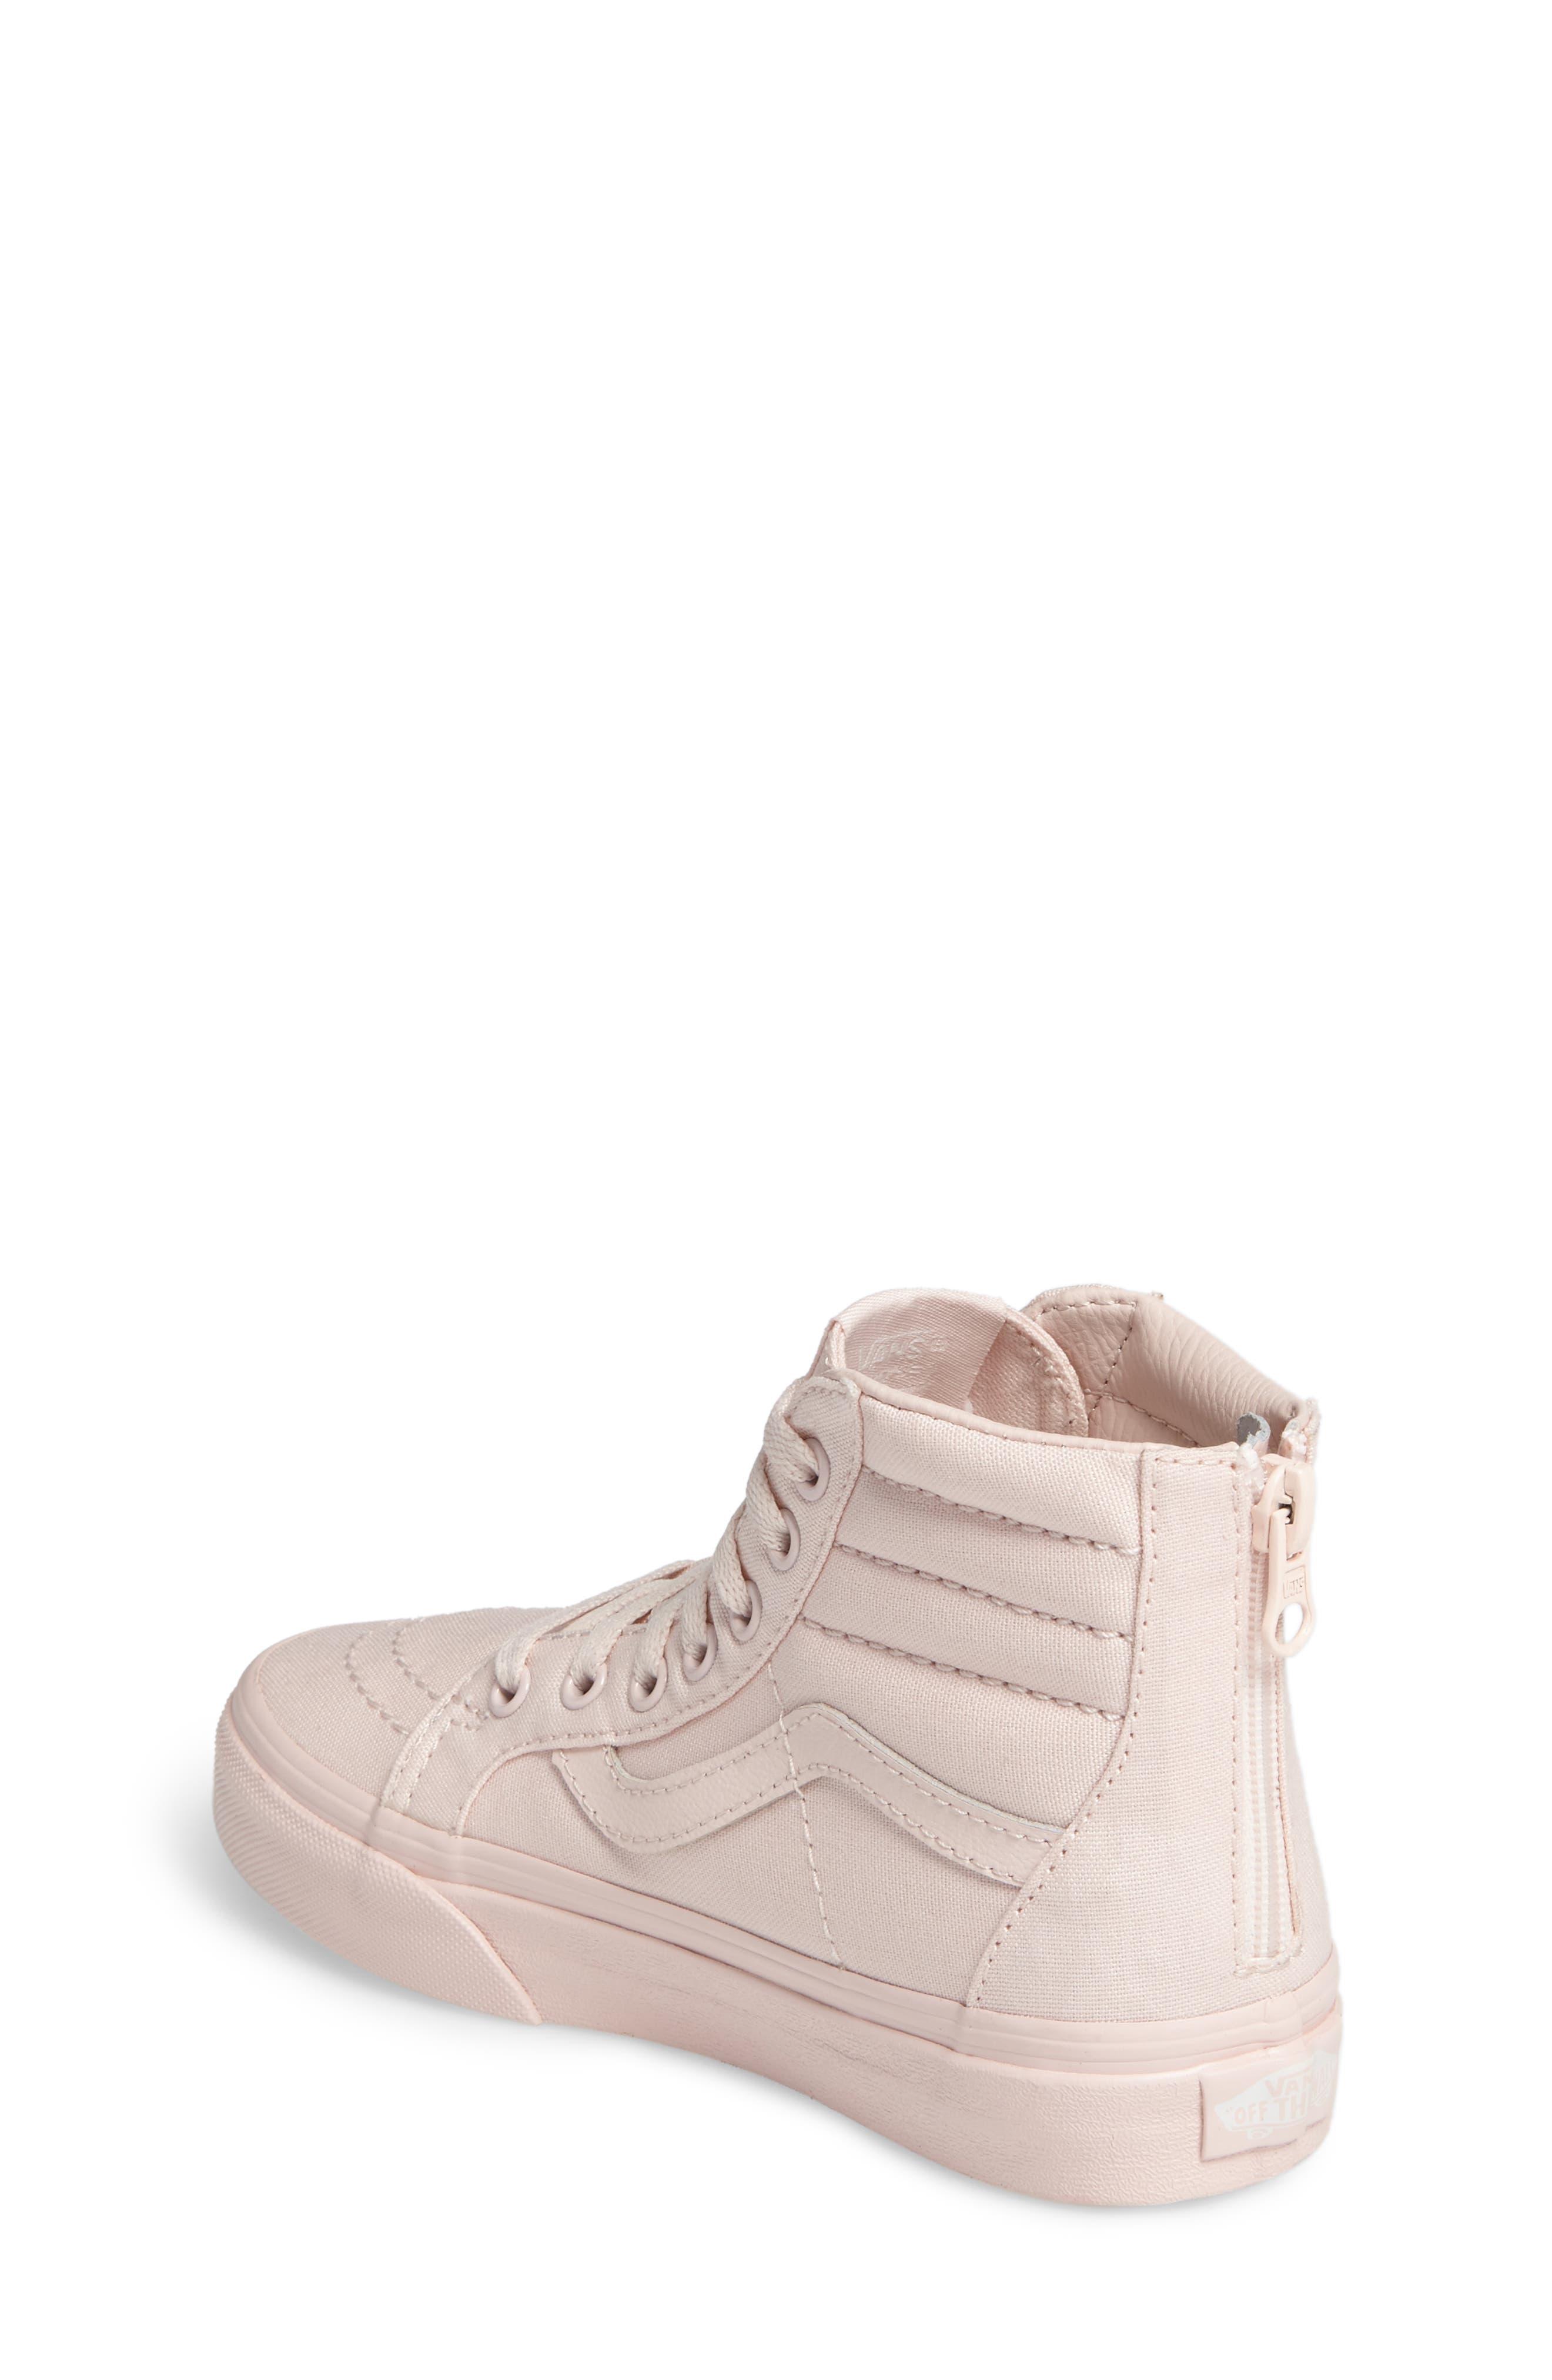 SK8-Hi Zip Sneaker,                             Alternate thumbnail 2, color,                             Peach Blush Canvas